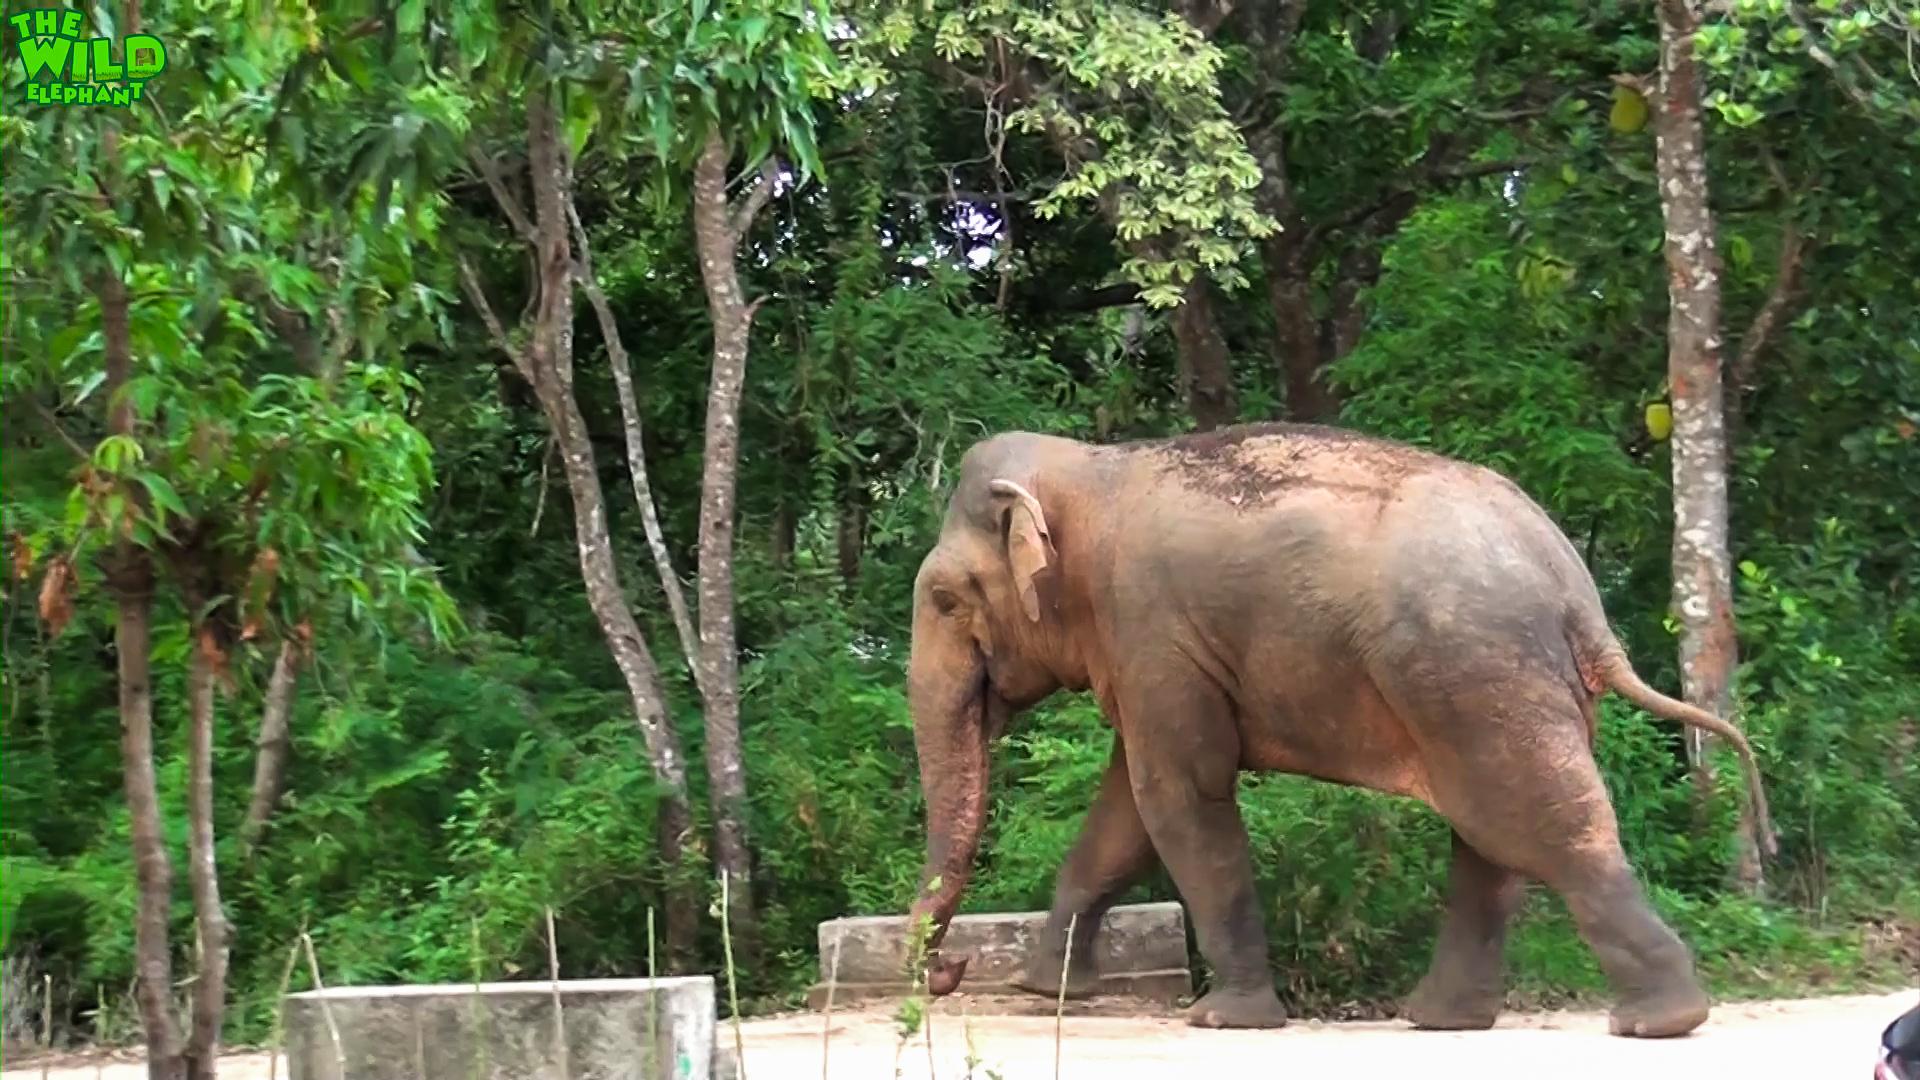 A Monster Elephant Invades a Village